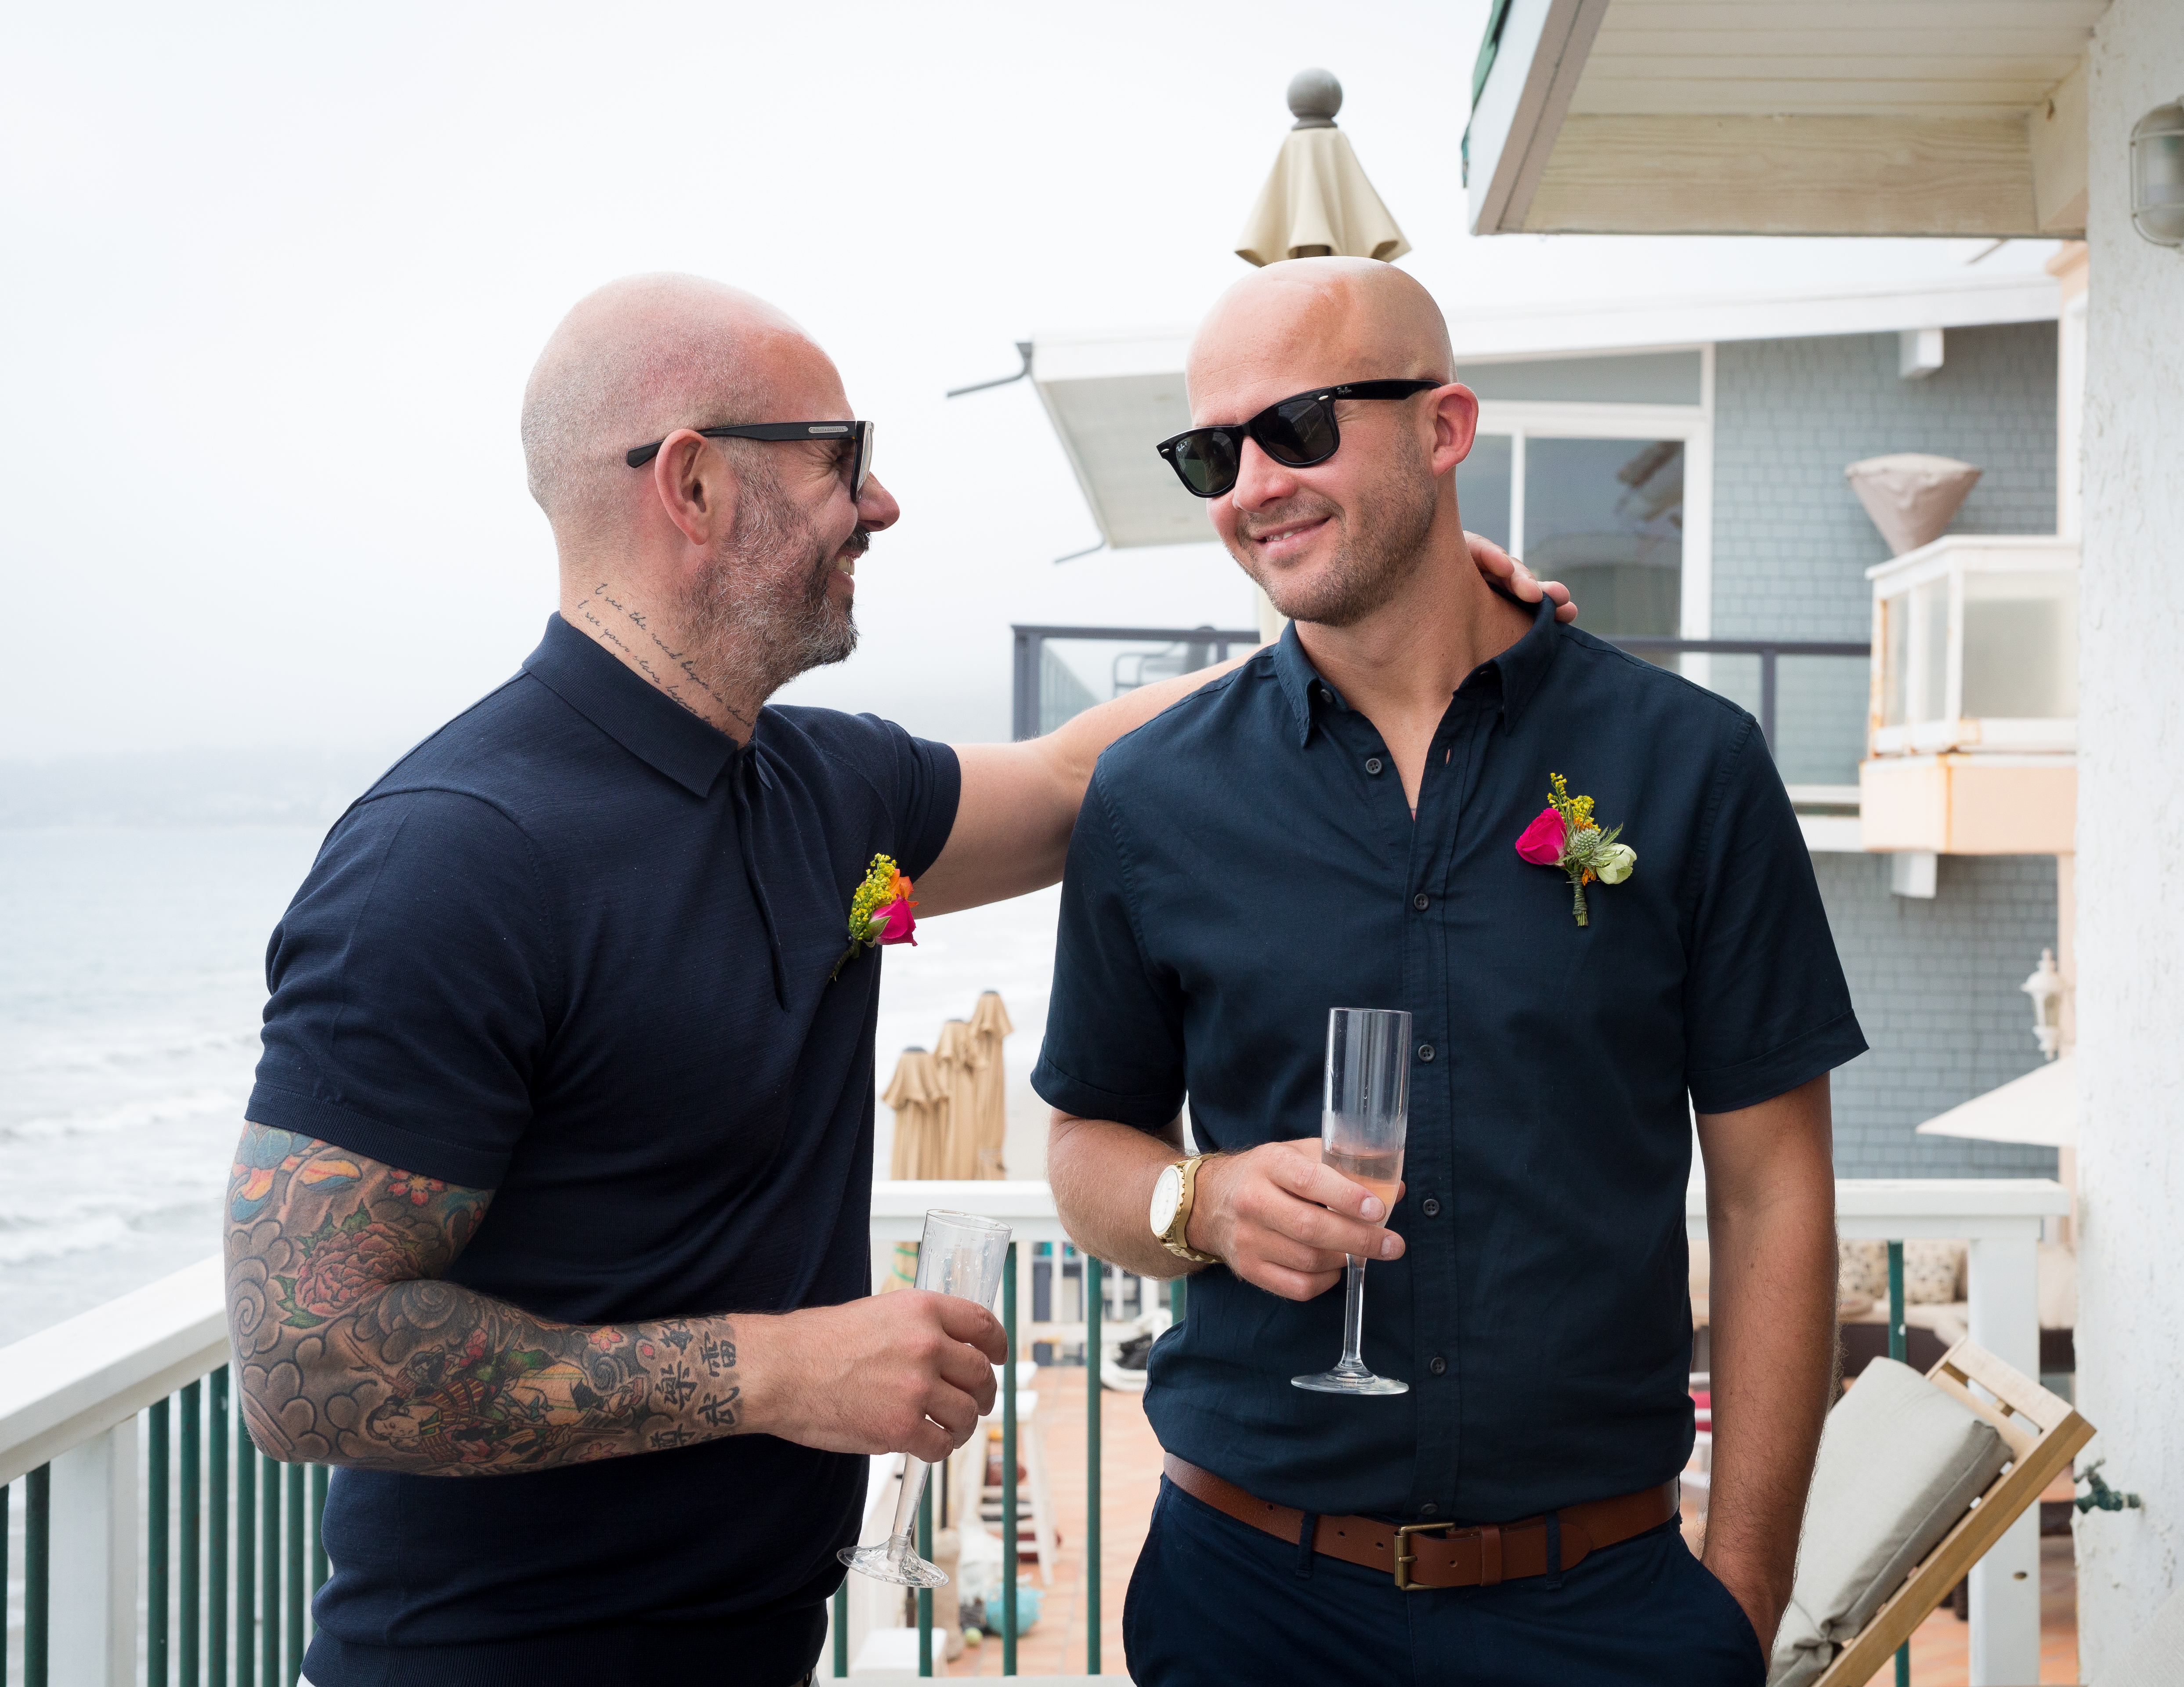 Gay elope in LA Malibu wedding officiant